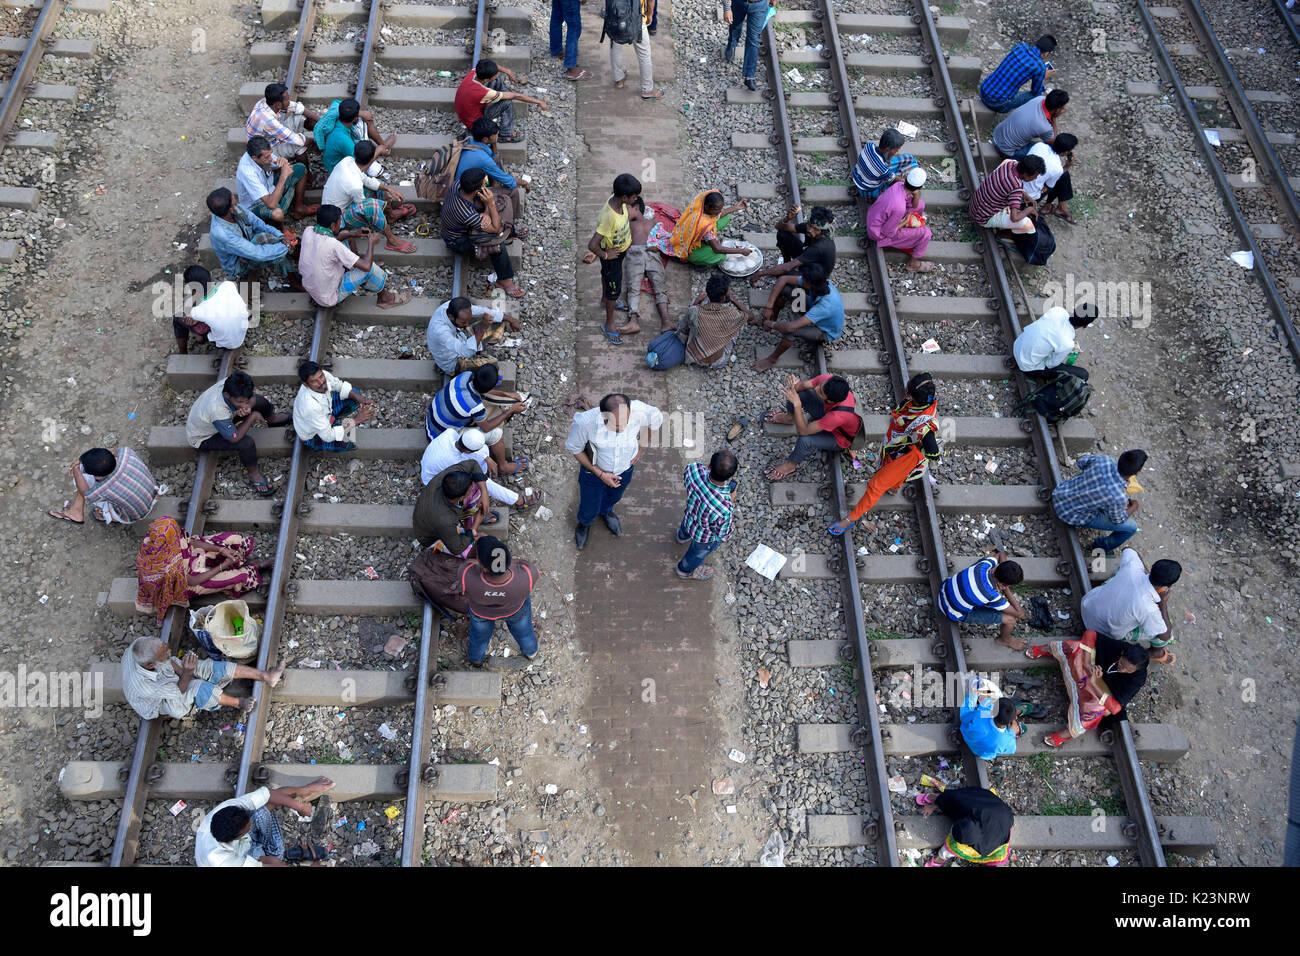 Dhaka, Bangladesh. 29th Aug, 2017. Bangladeshi homebound people wait for train as they head to their hometowns ahead of the Muslim holiday of Eid al-Adha, in Dhaka, Bangladesh. Credit: SK Hasan Ali/Alamy Live News - Stock Image